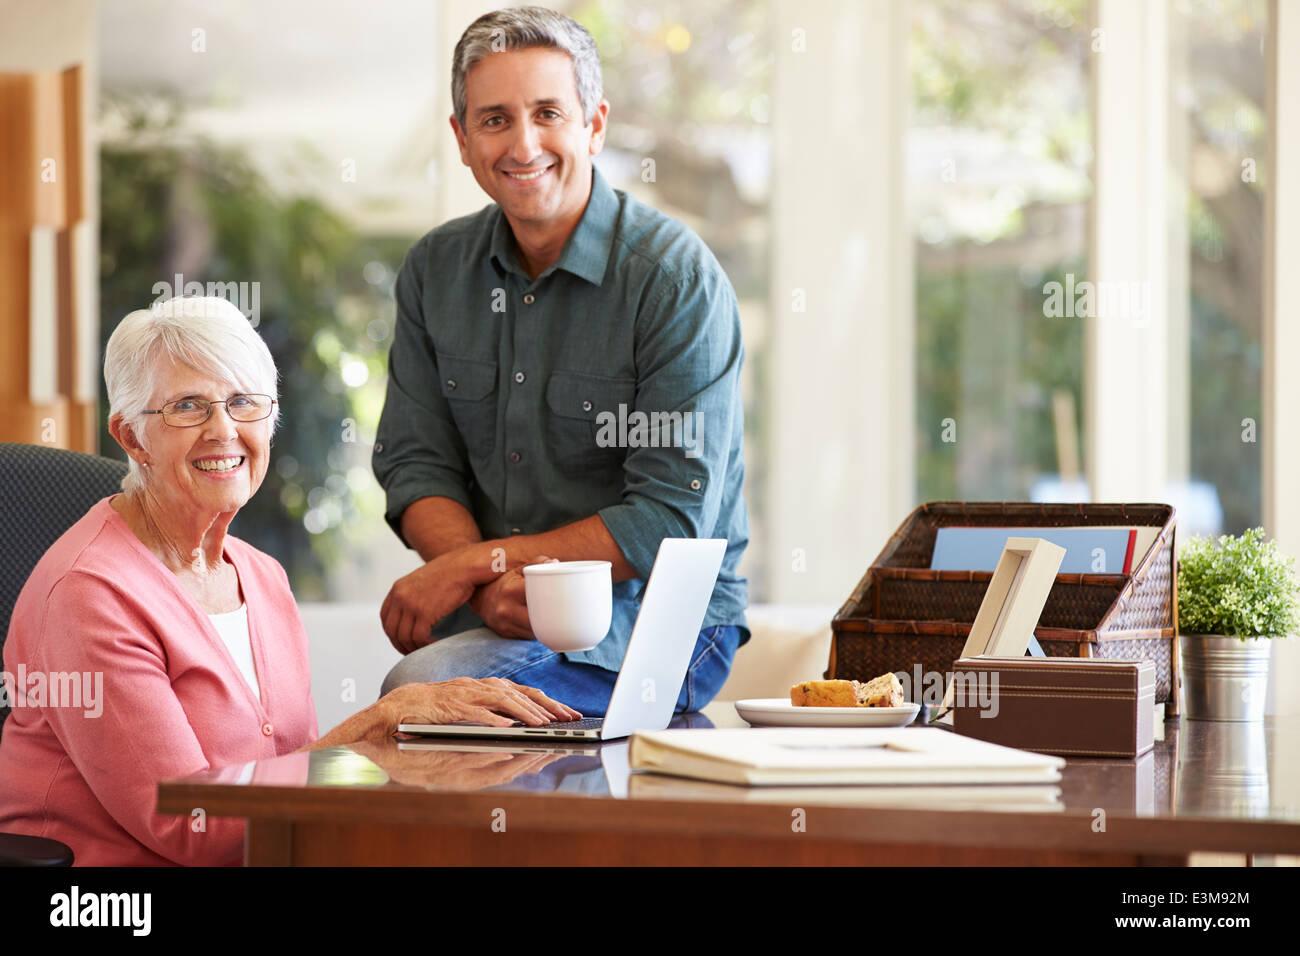 Erwachsenen Sohn helfende Mutter mit Laptop Stockbild